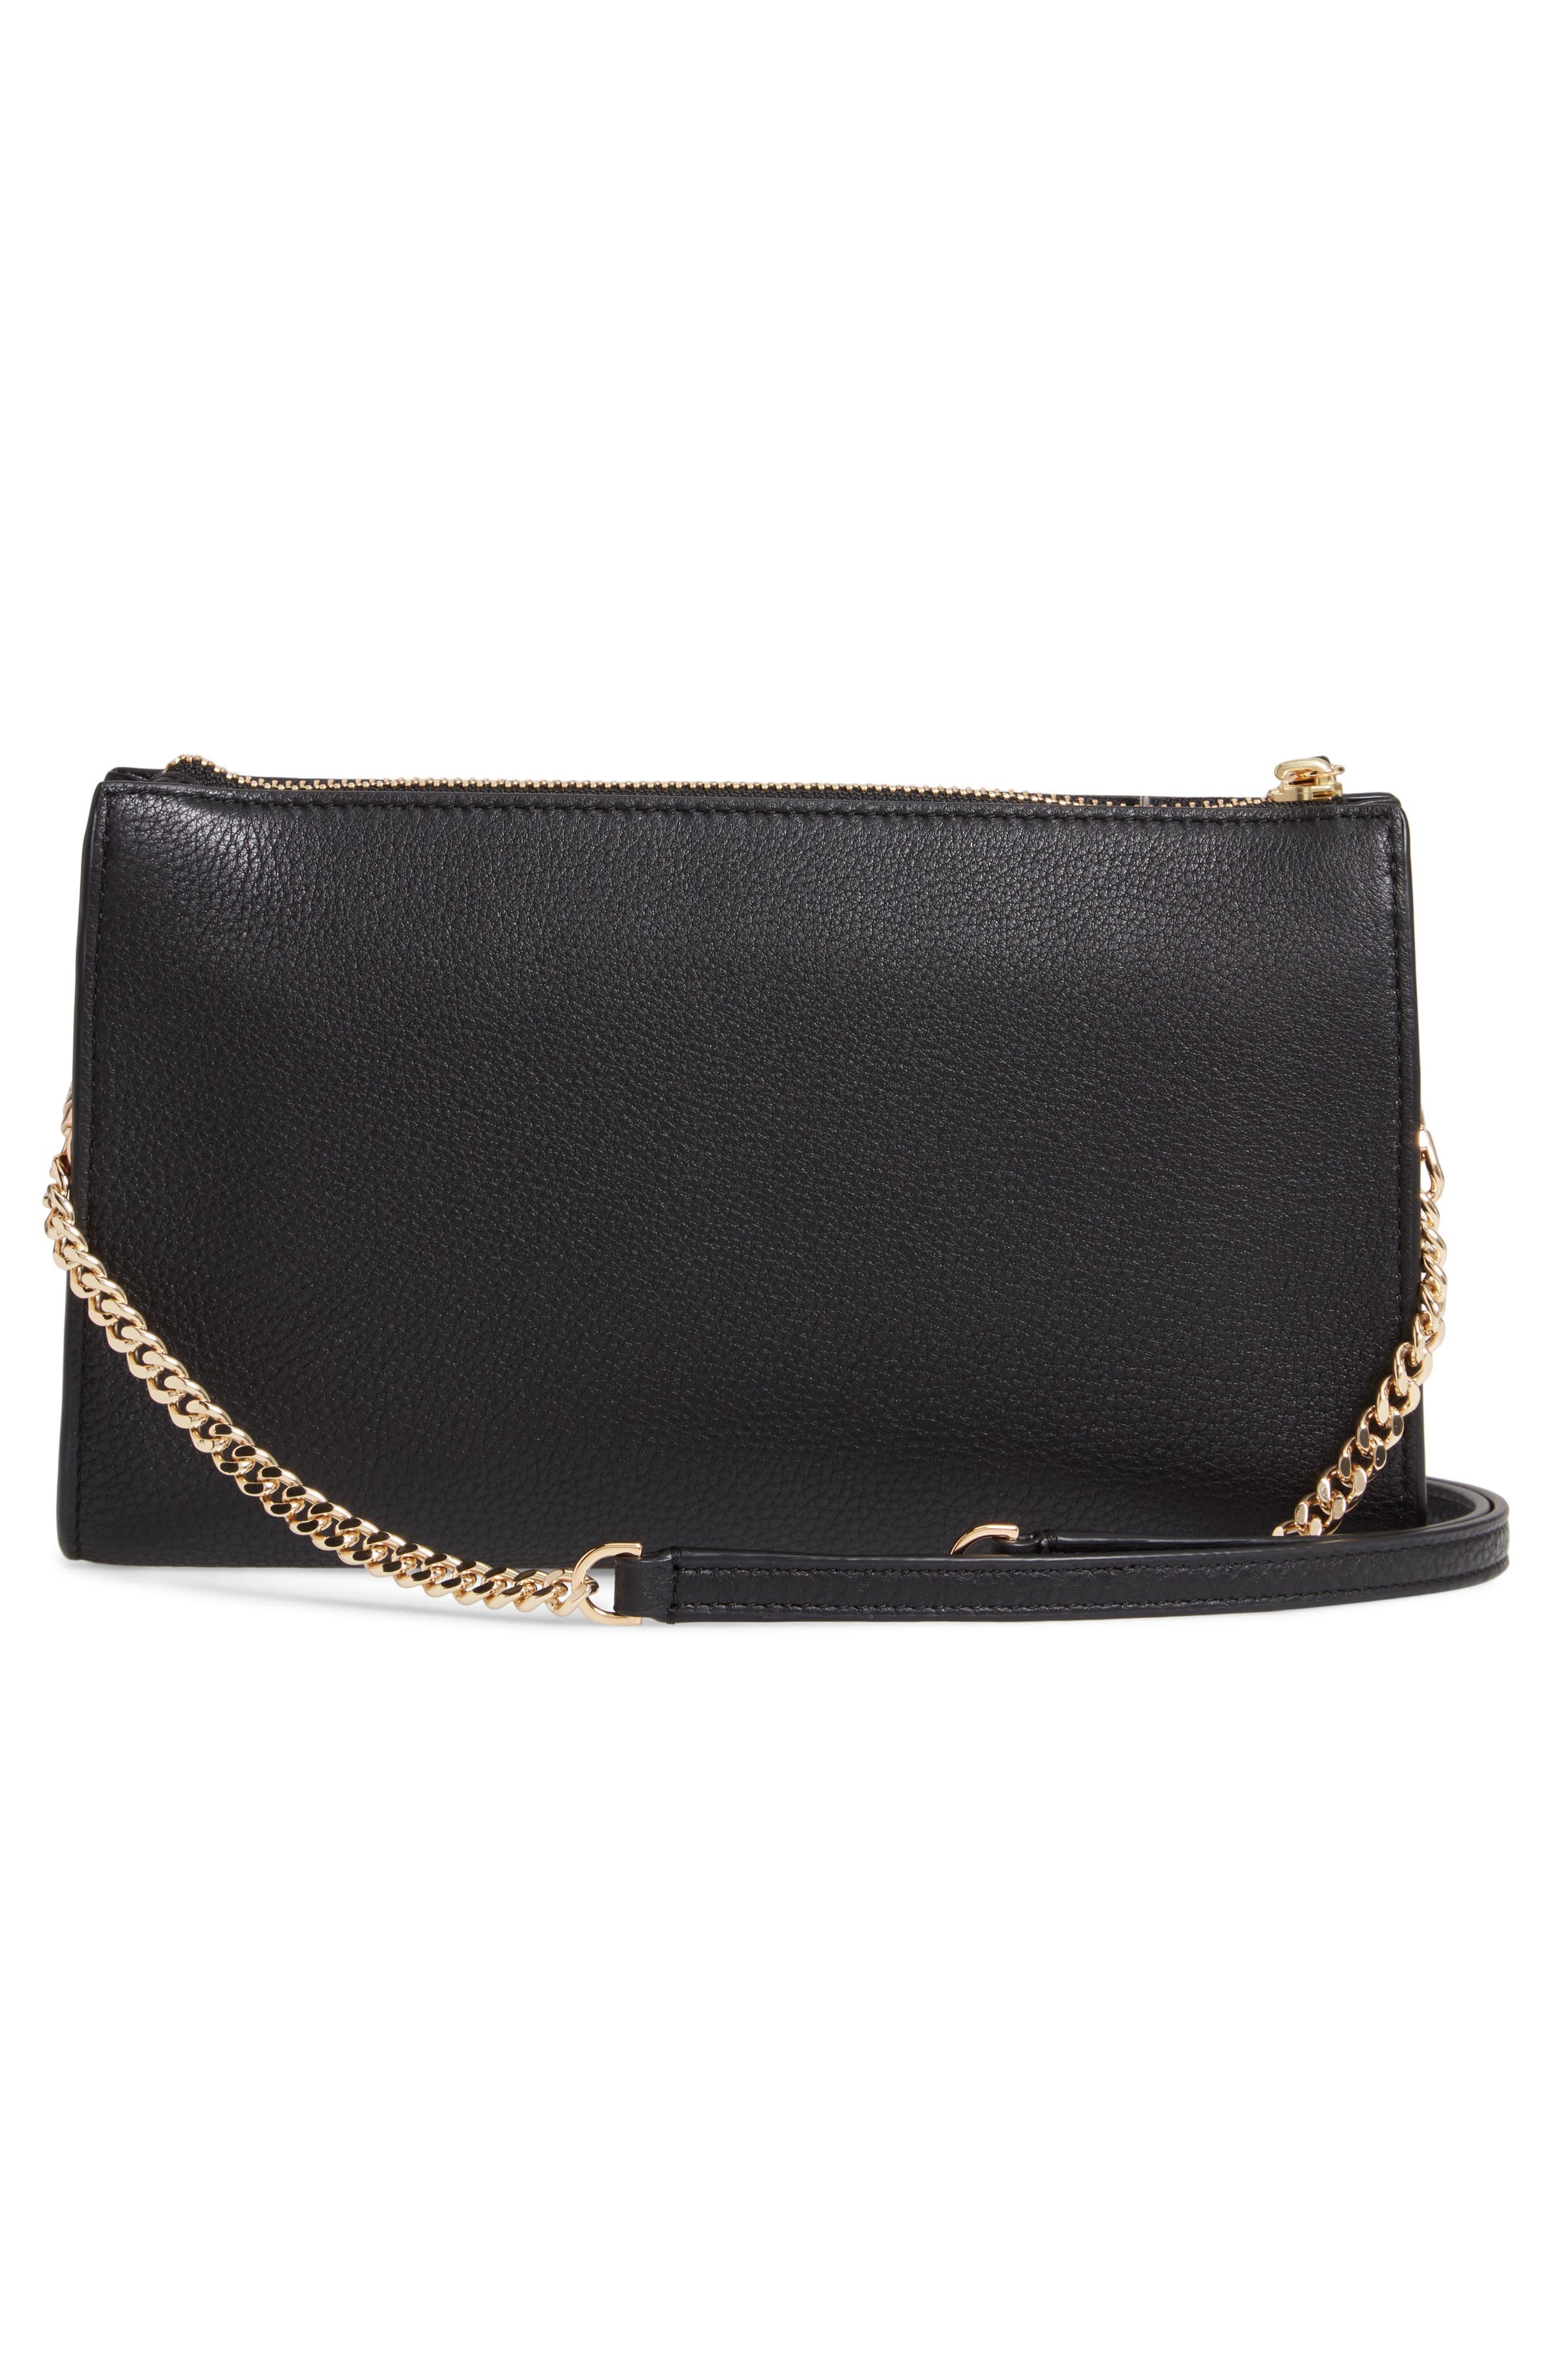 TORY BURCH,                             Pebbled Leather Top Zip Crossbody Bag,                             Alternate thumbnail 3, color,                             BLACK